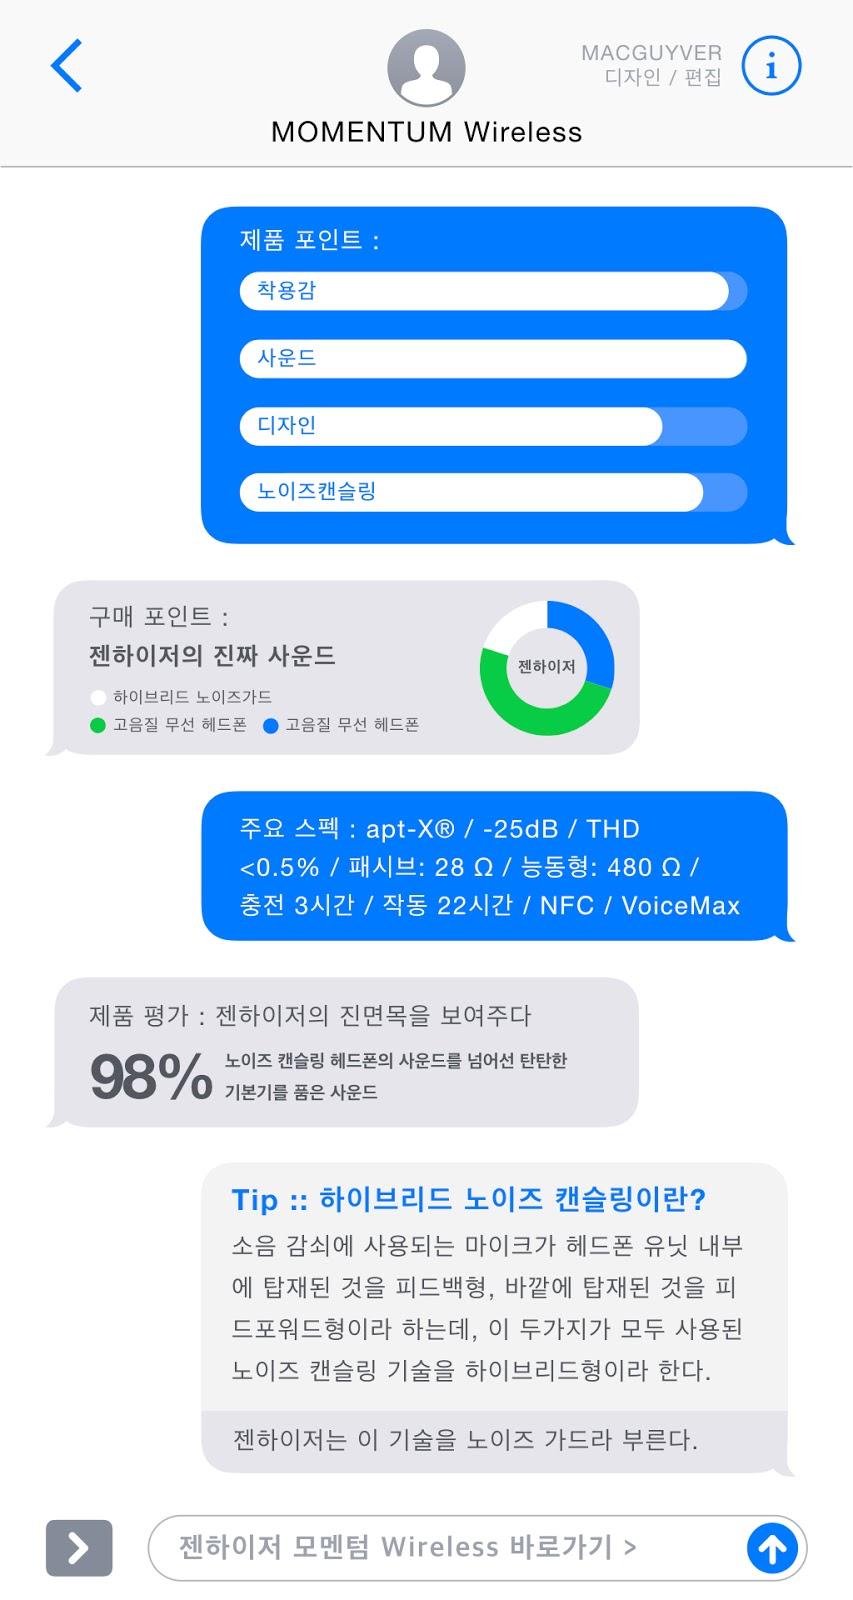 http://search.danawa.com/dsearch.php?k1=%EC%A0%A0%ED%95%98%EC%9D%B4%EC%A0%80+MOMENTUM+Wireless&module=goods&act=dispMain